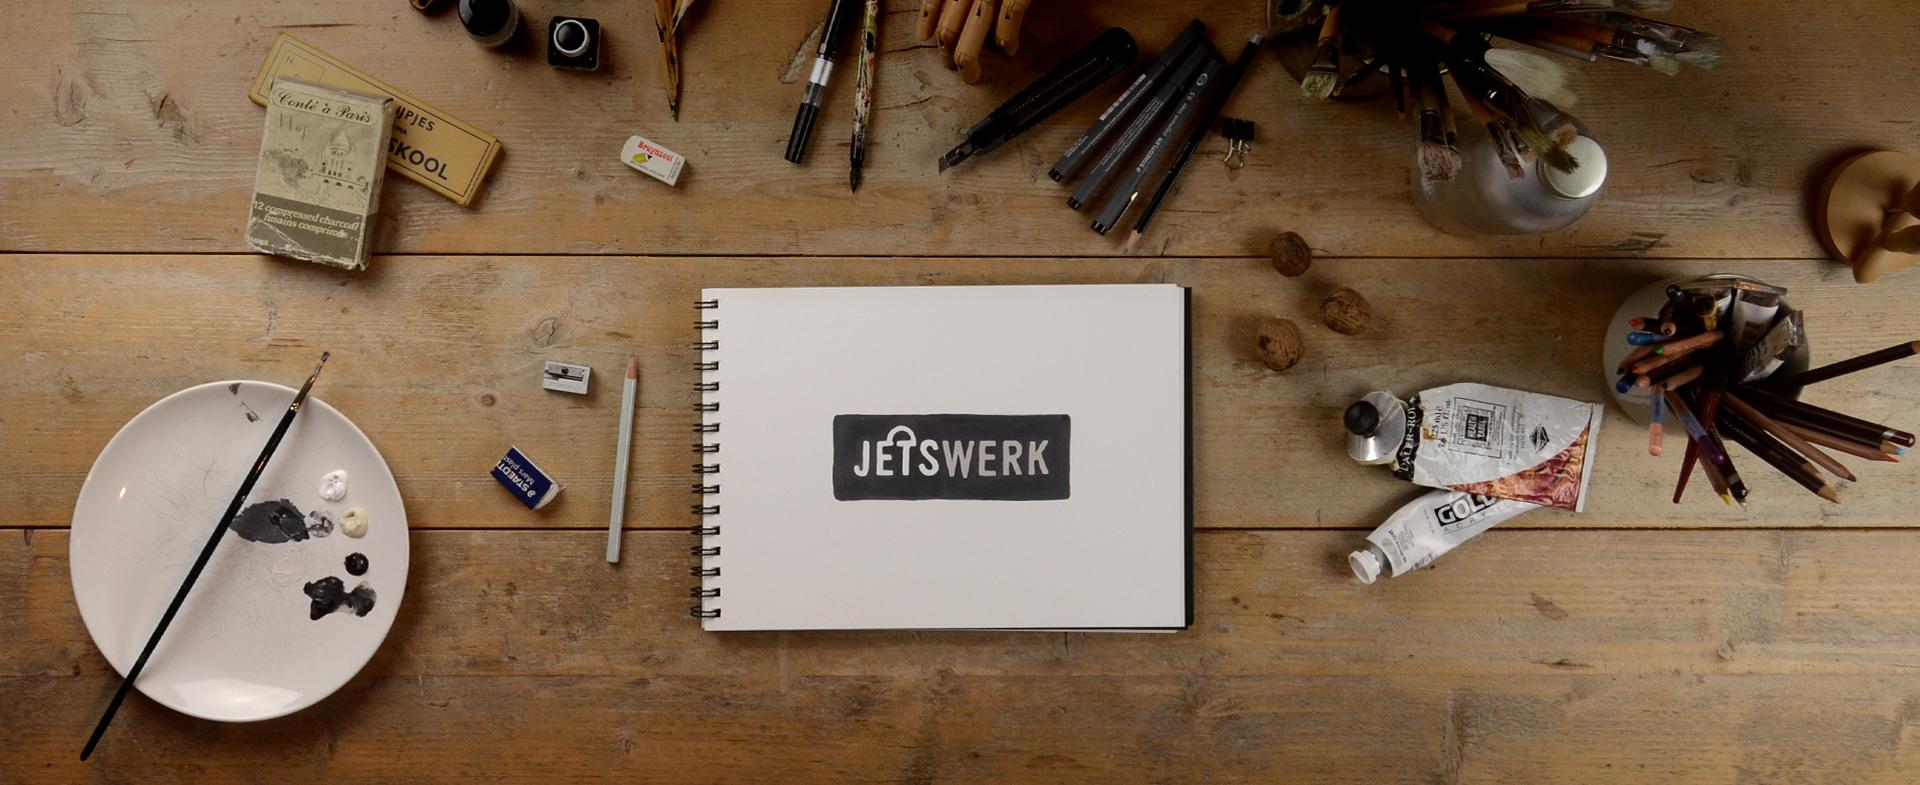 Bureau met jetswerk logo